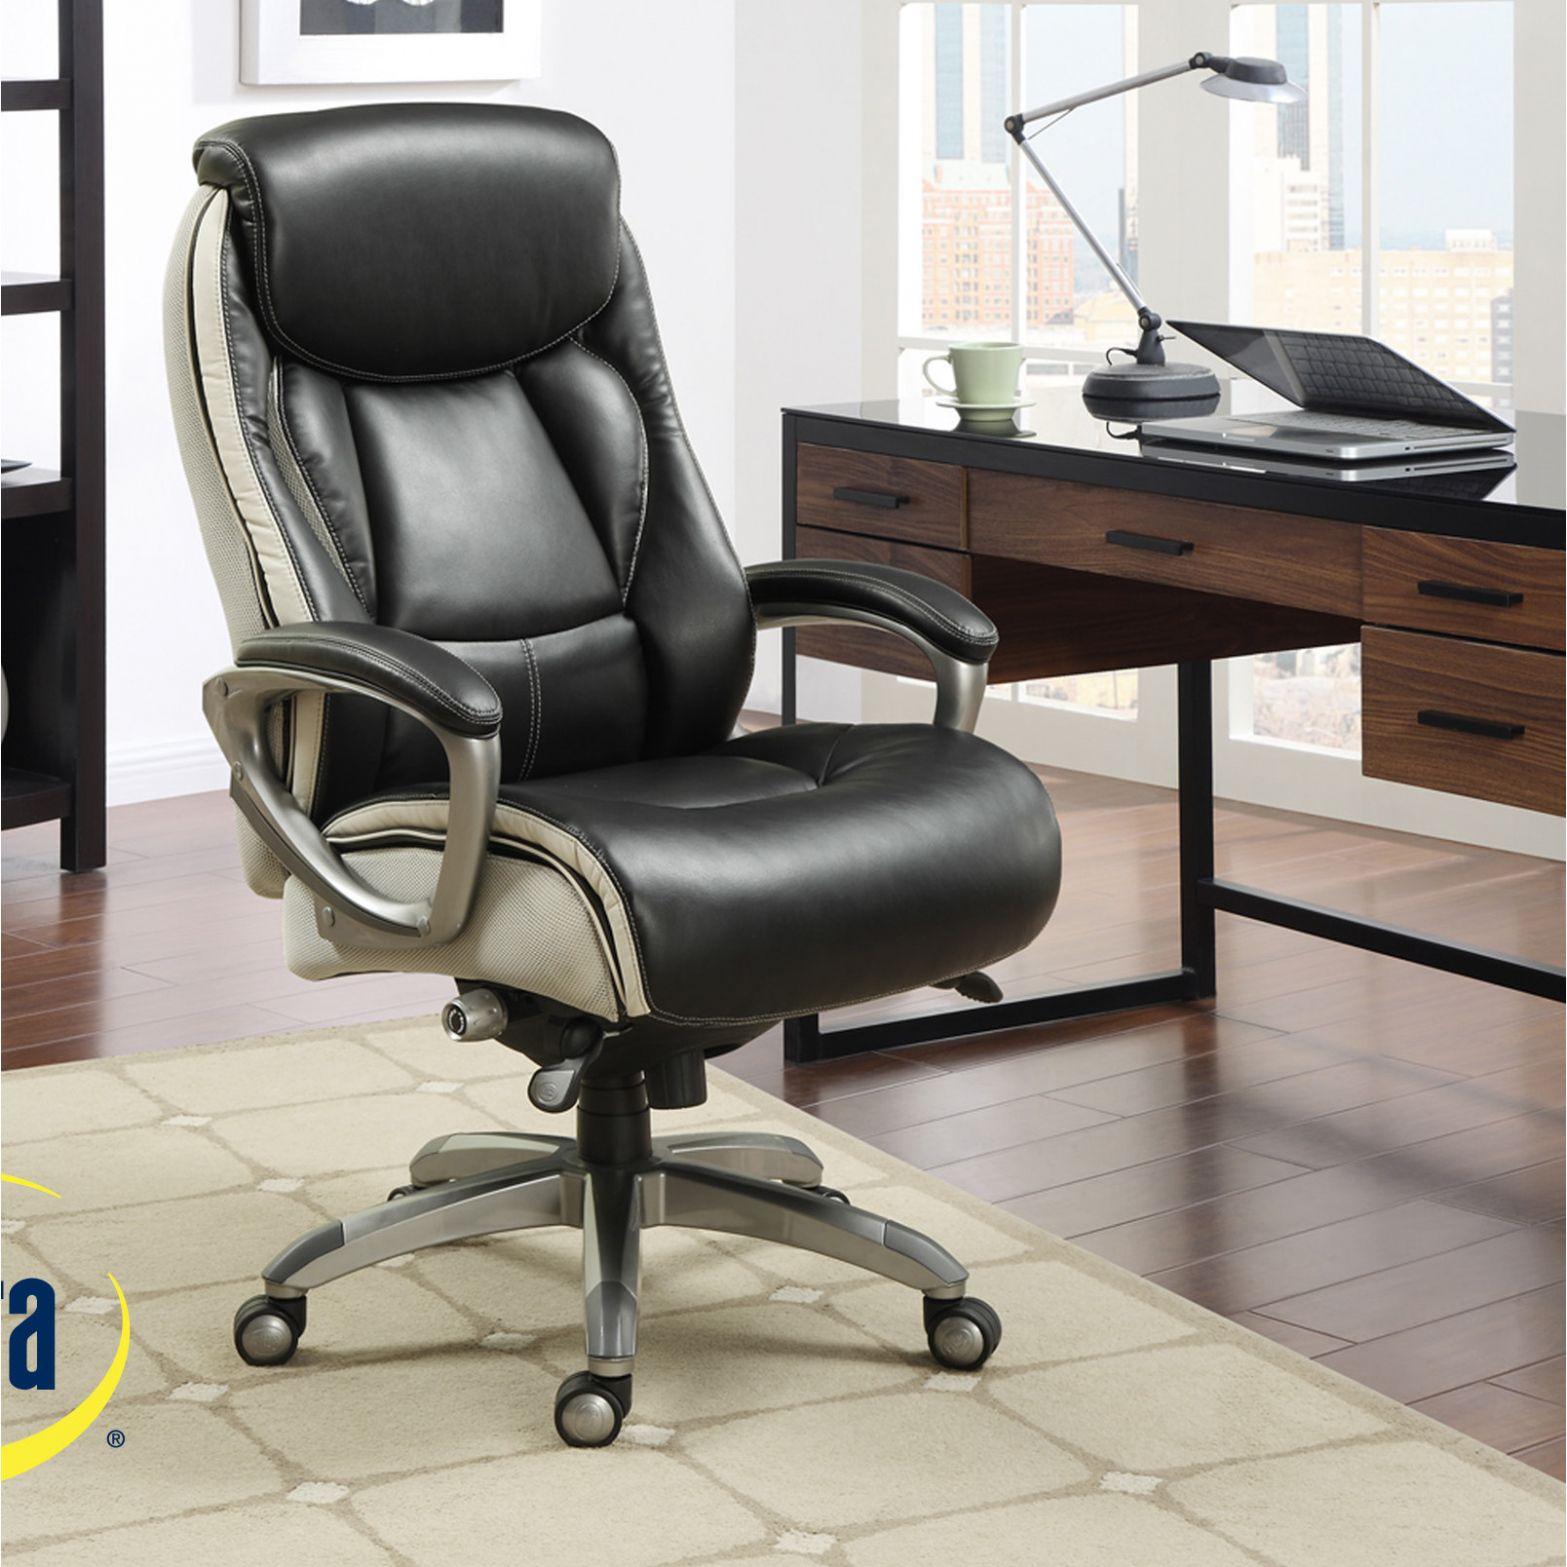 Merveilleux 70+ Serta Executive High Back Chair   Modern Home Office Furniture Check  More At Http